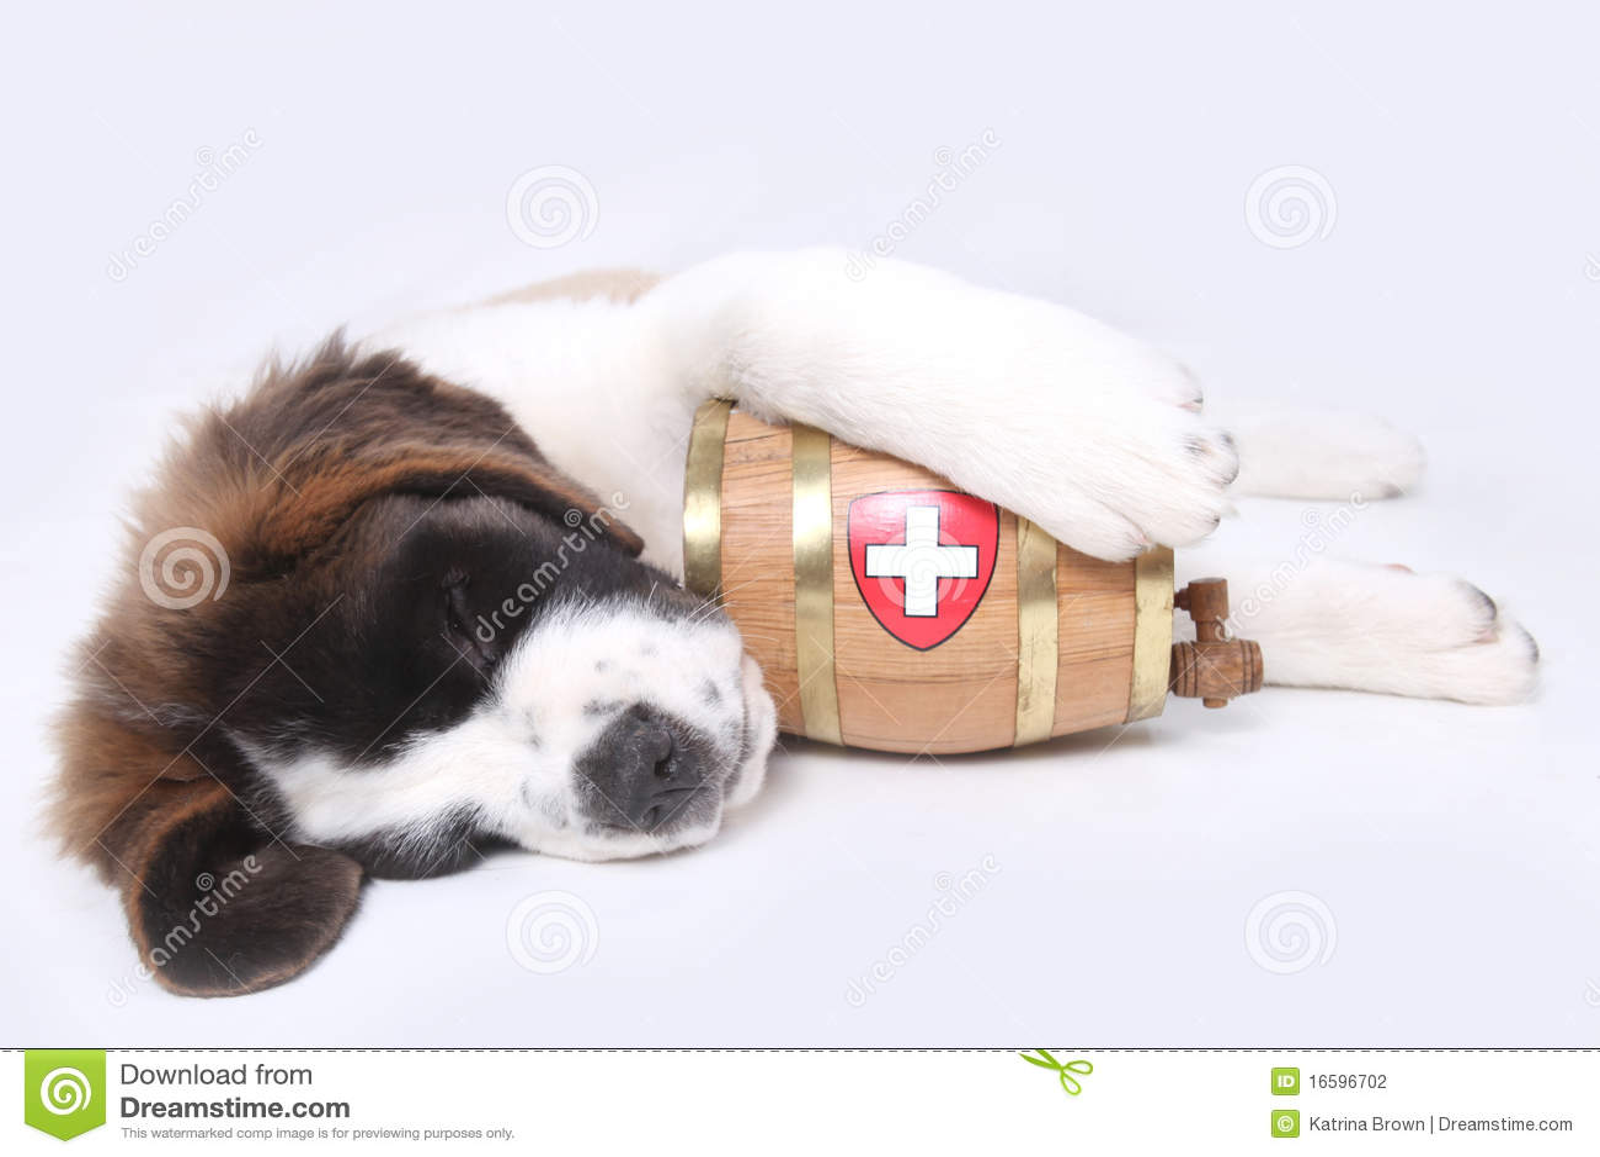 A Saint Bernard Puppy With Rescue Barrel Stock Photo